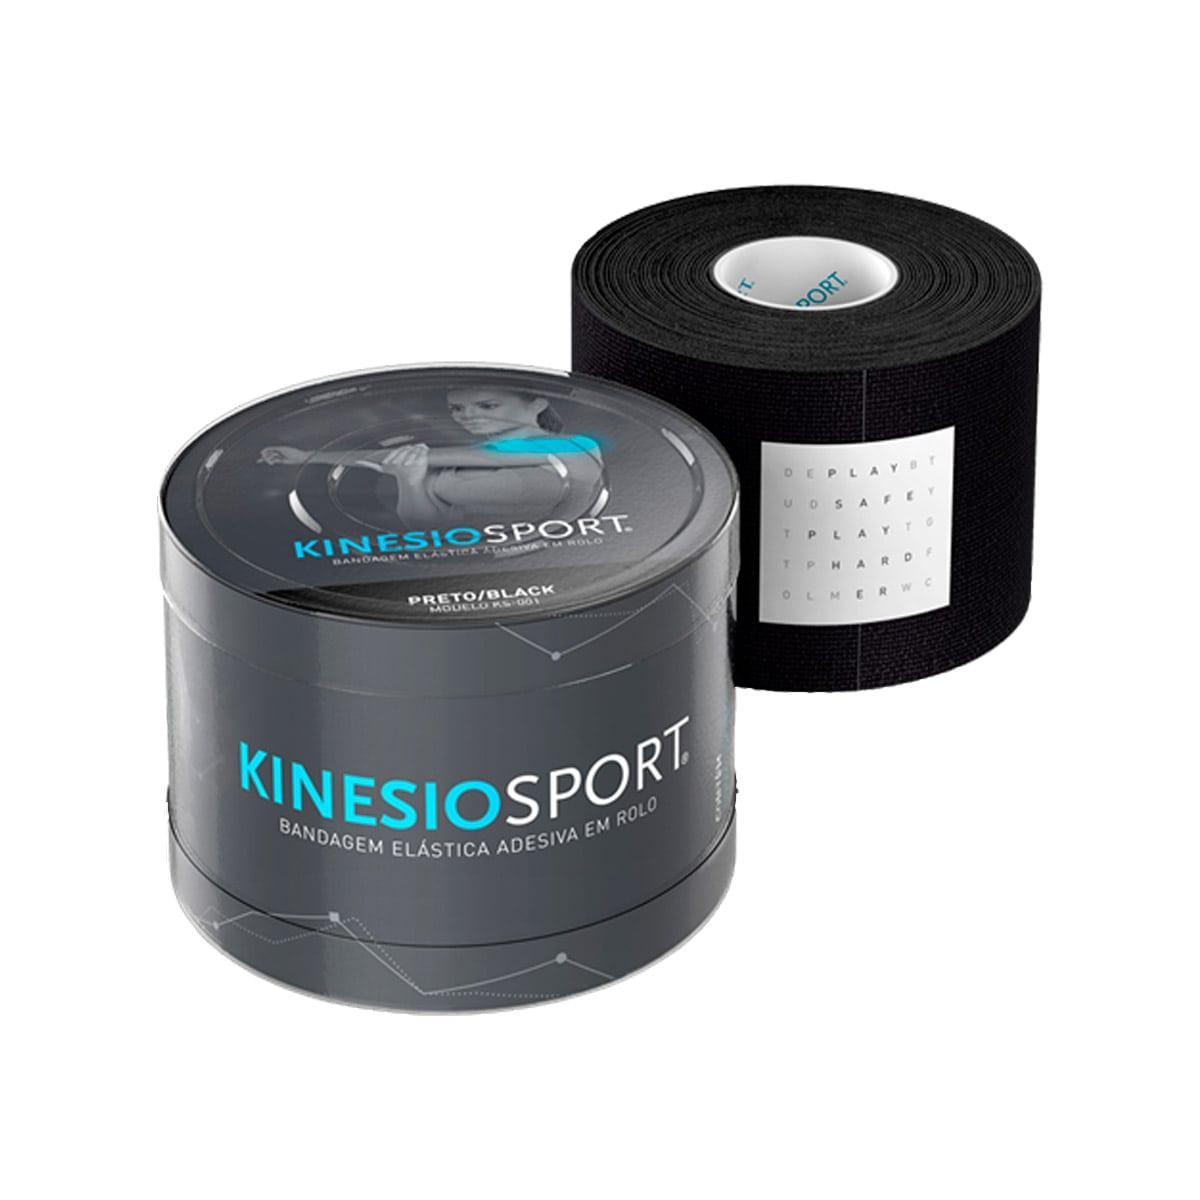 KinesioSport Bandagem Elástica Adesiva 5m x 5cm